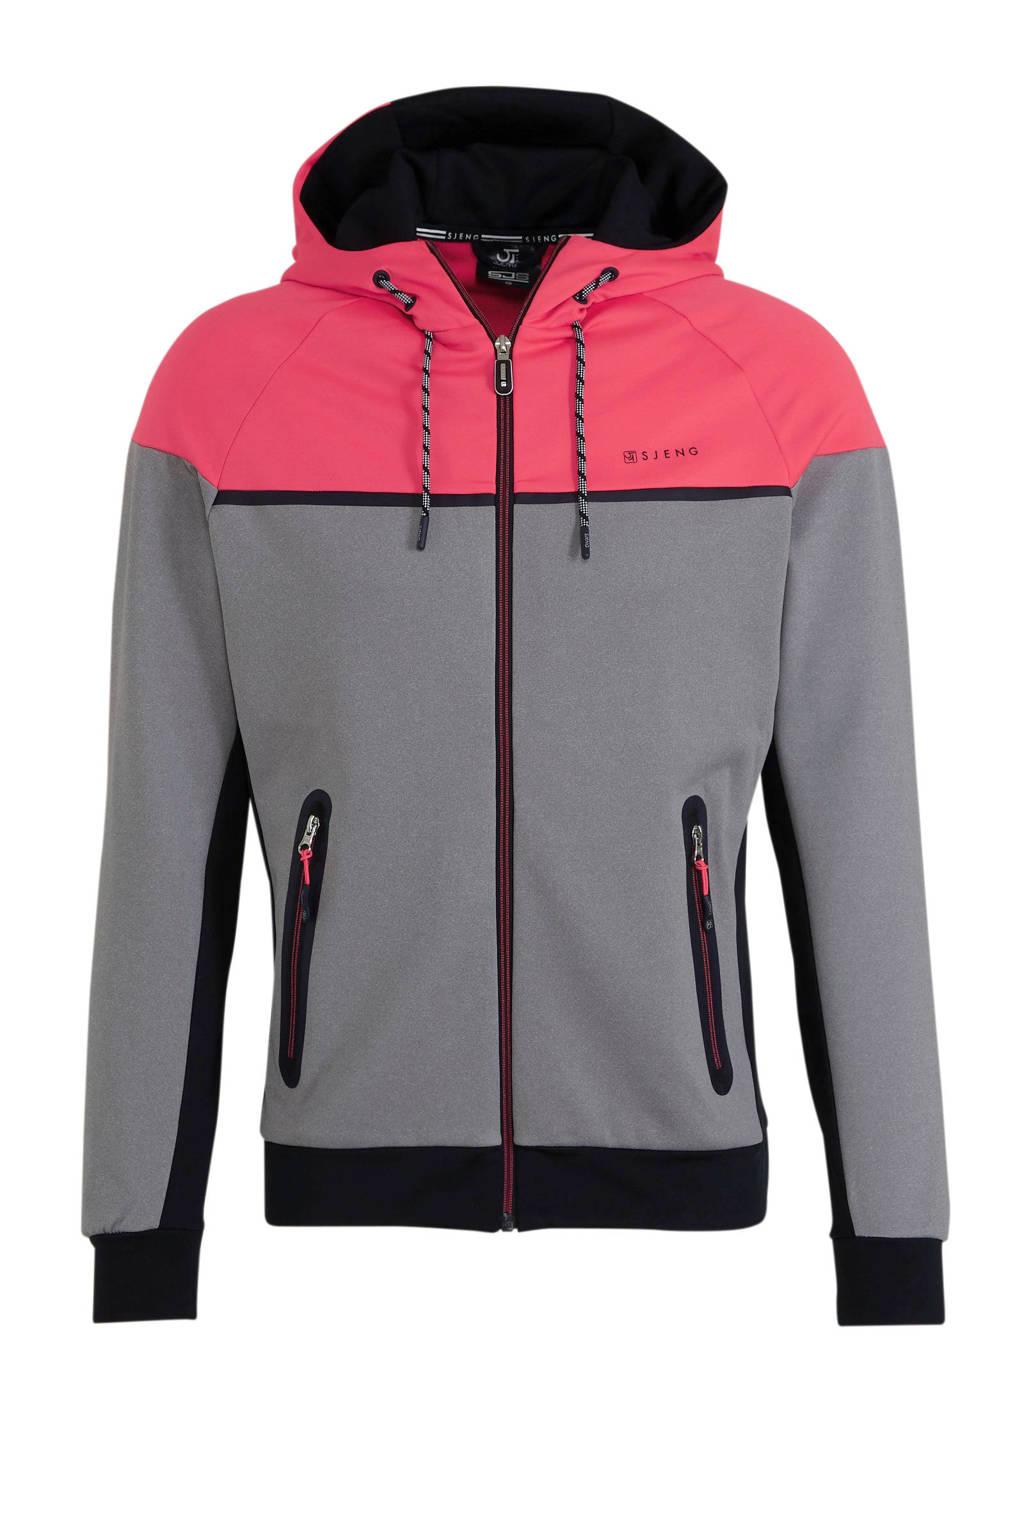 Sjeng Sports   vest grijs melange/roze, Grijs melange/roze